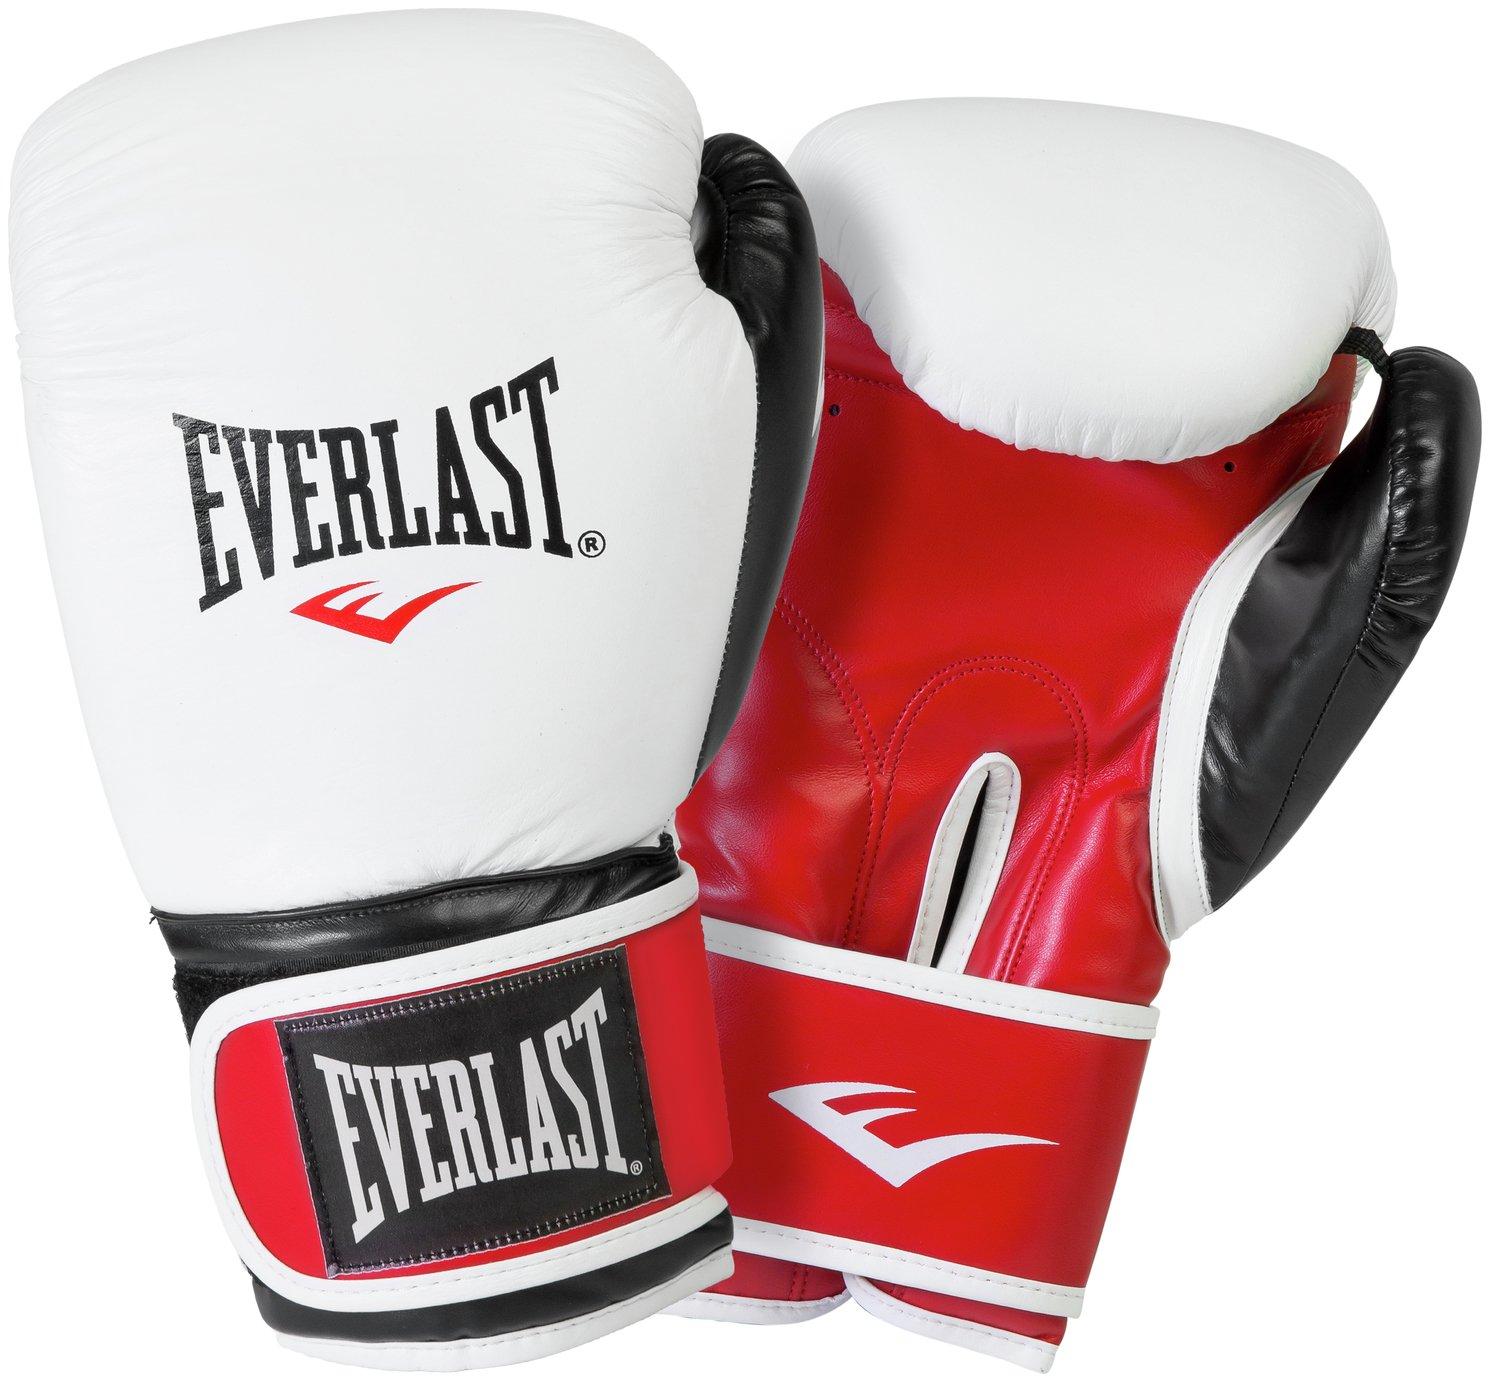 Everlast 14oz Leather Boxing Gloves